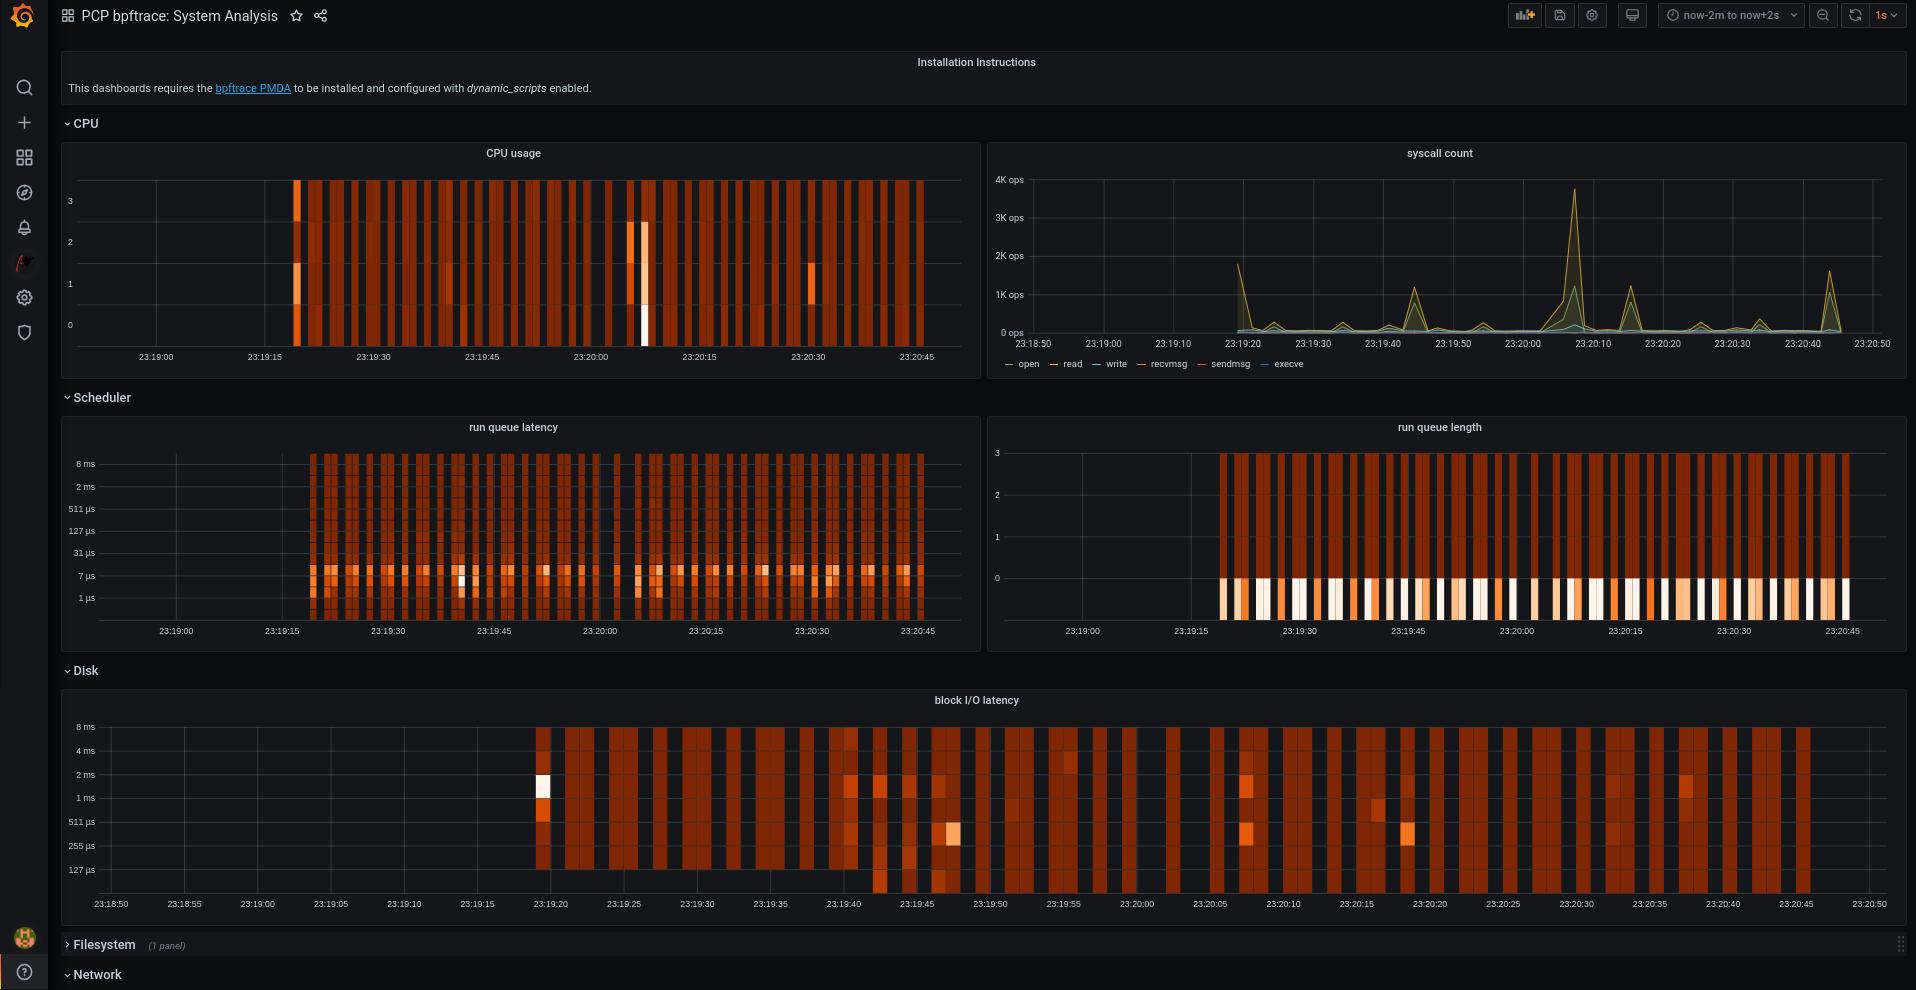 pcp bpftrace bpftrace system analysis